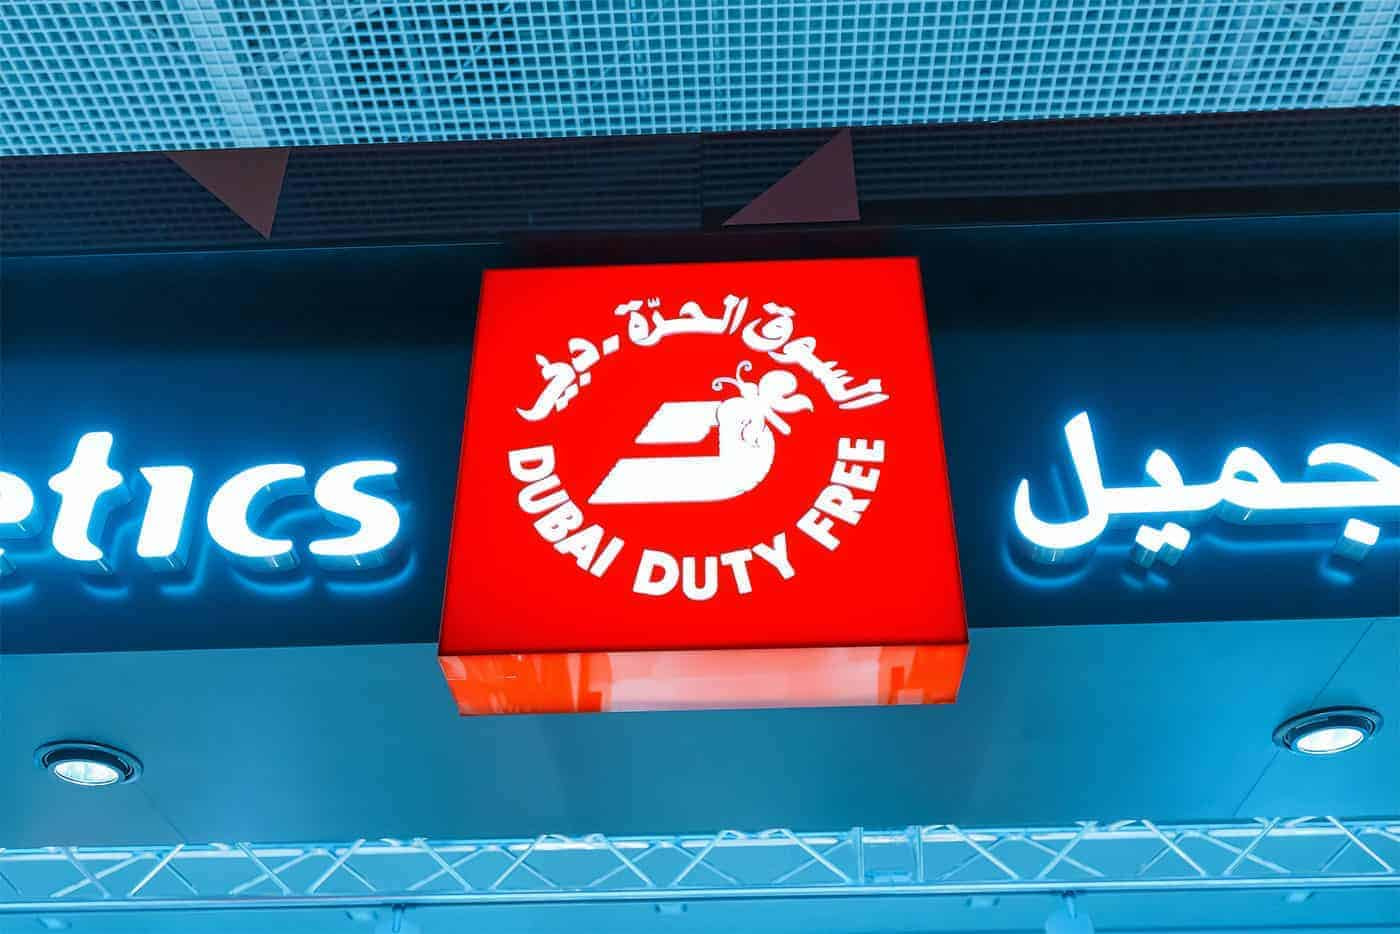 Dubai's duty free regime attracts worldwide visitors